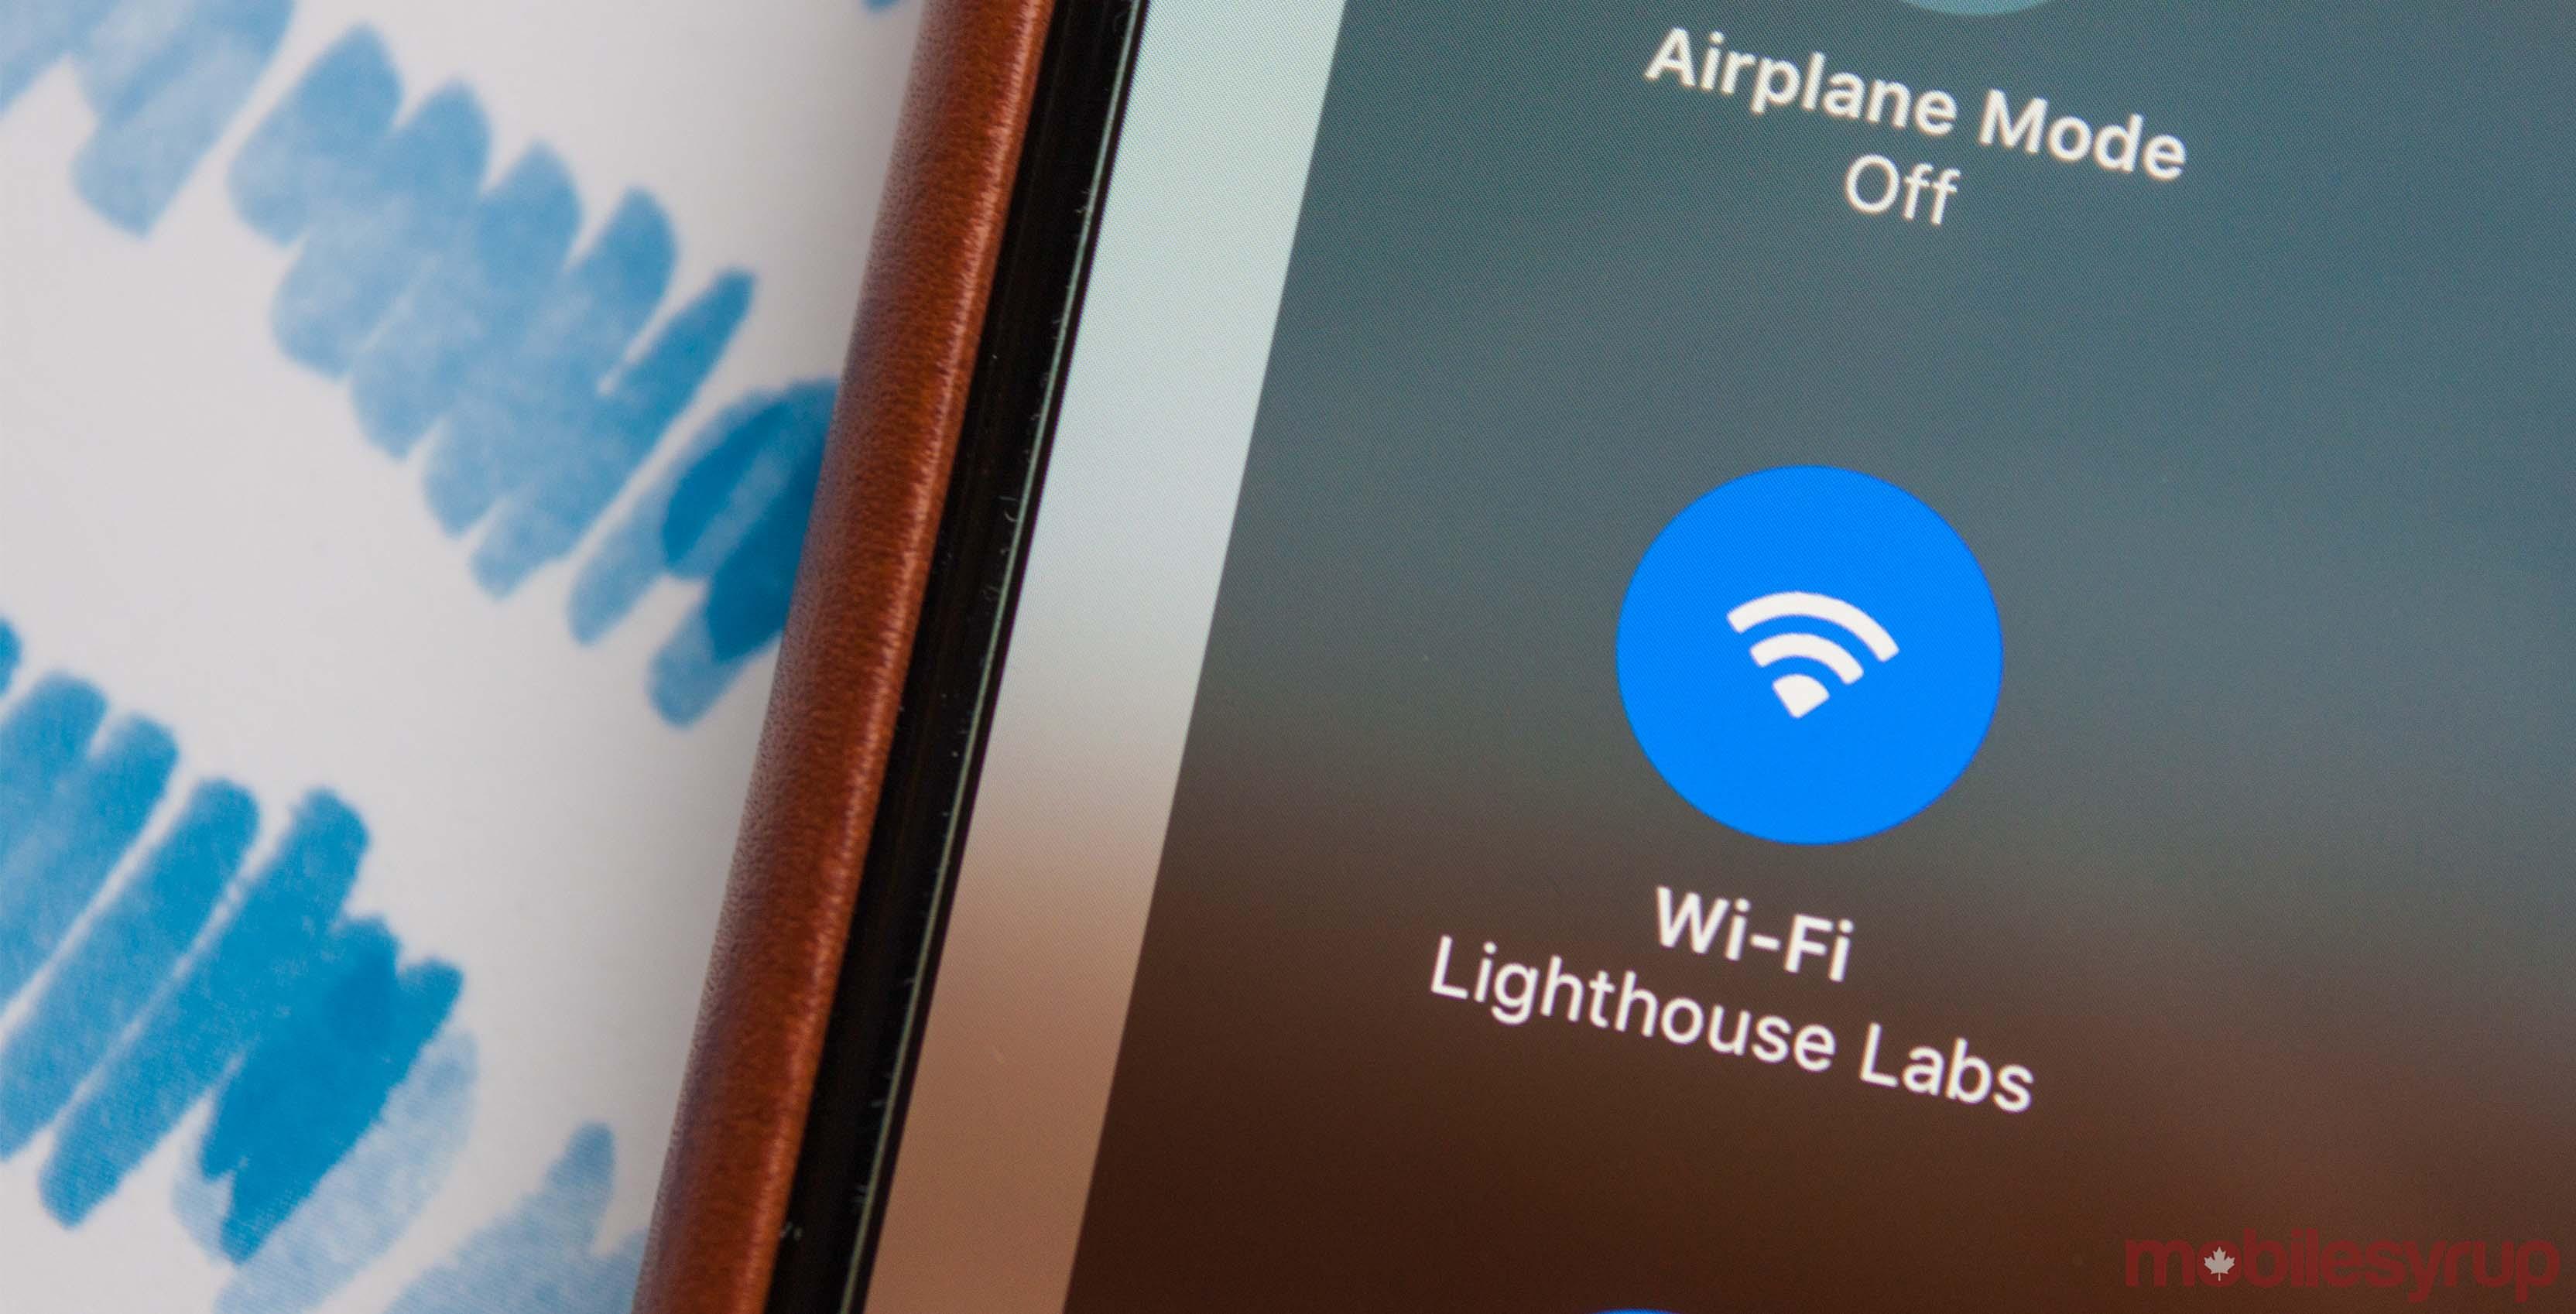 WiFi symbol, iOS